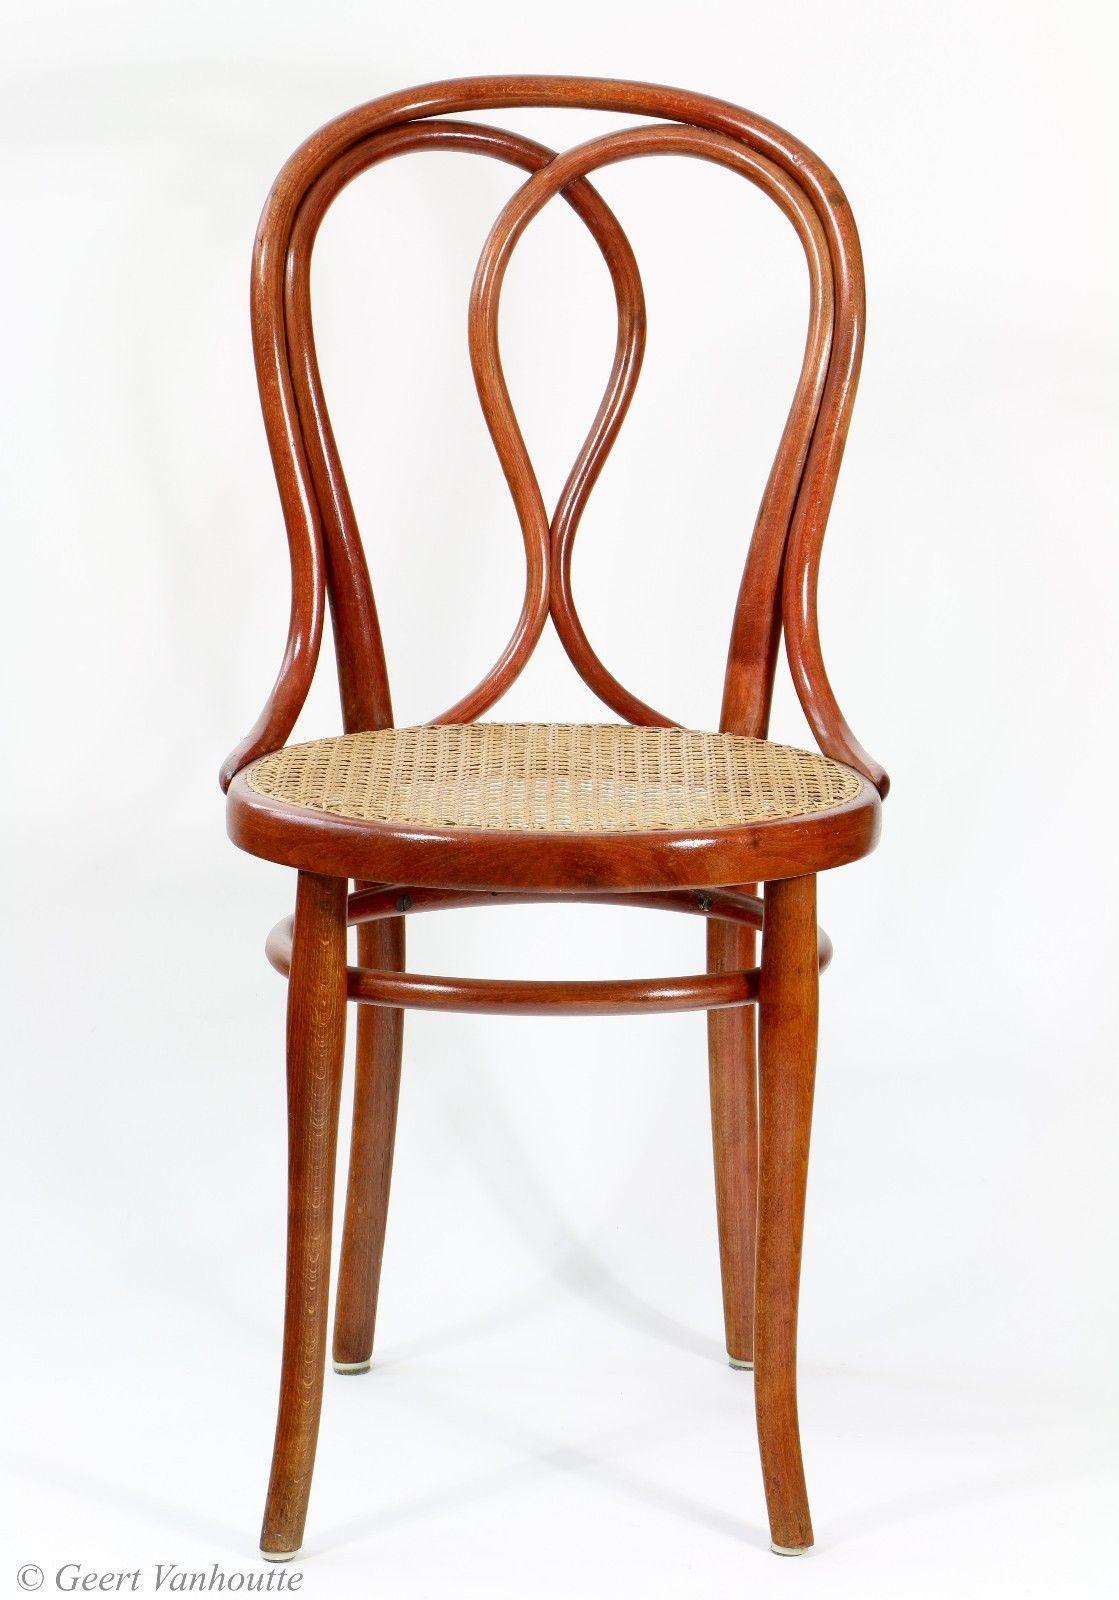 THONET Sessel Nr 29 14 ca 1881 1887